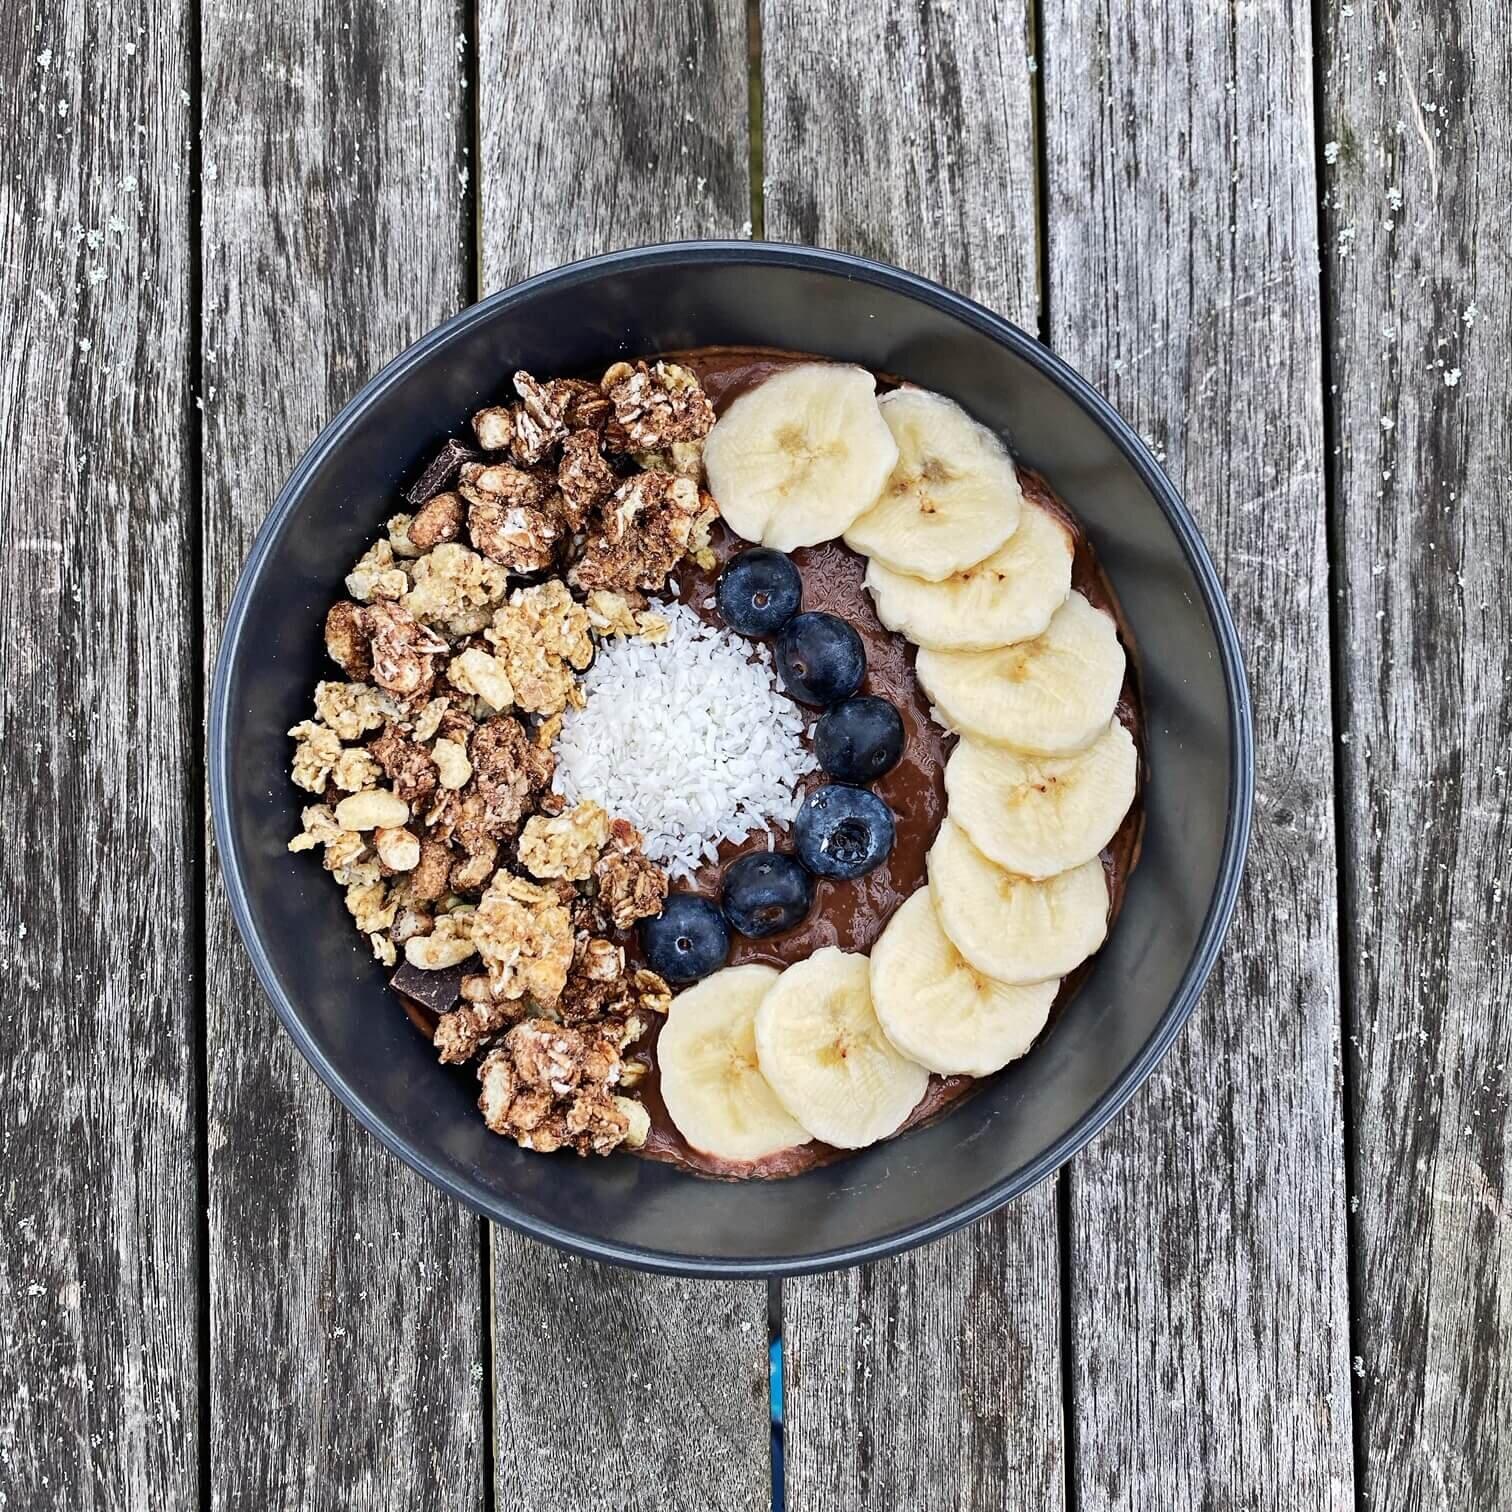 Vegan Chocolate and Banana Smoothie Bowl